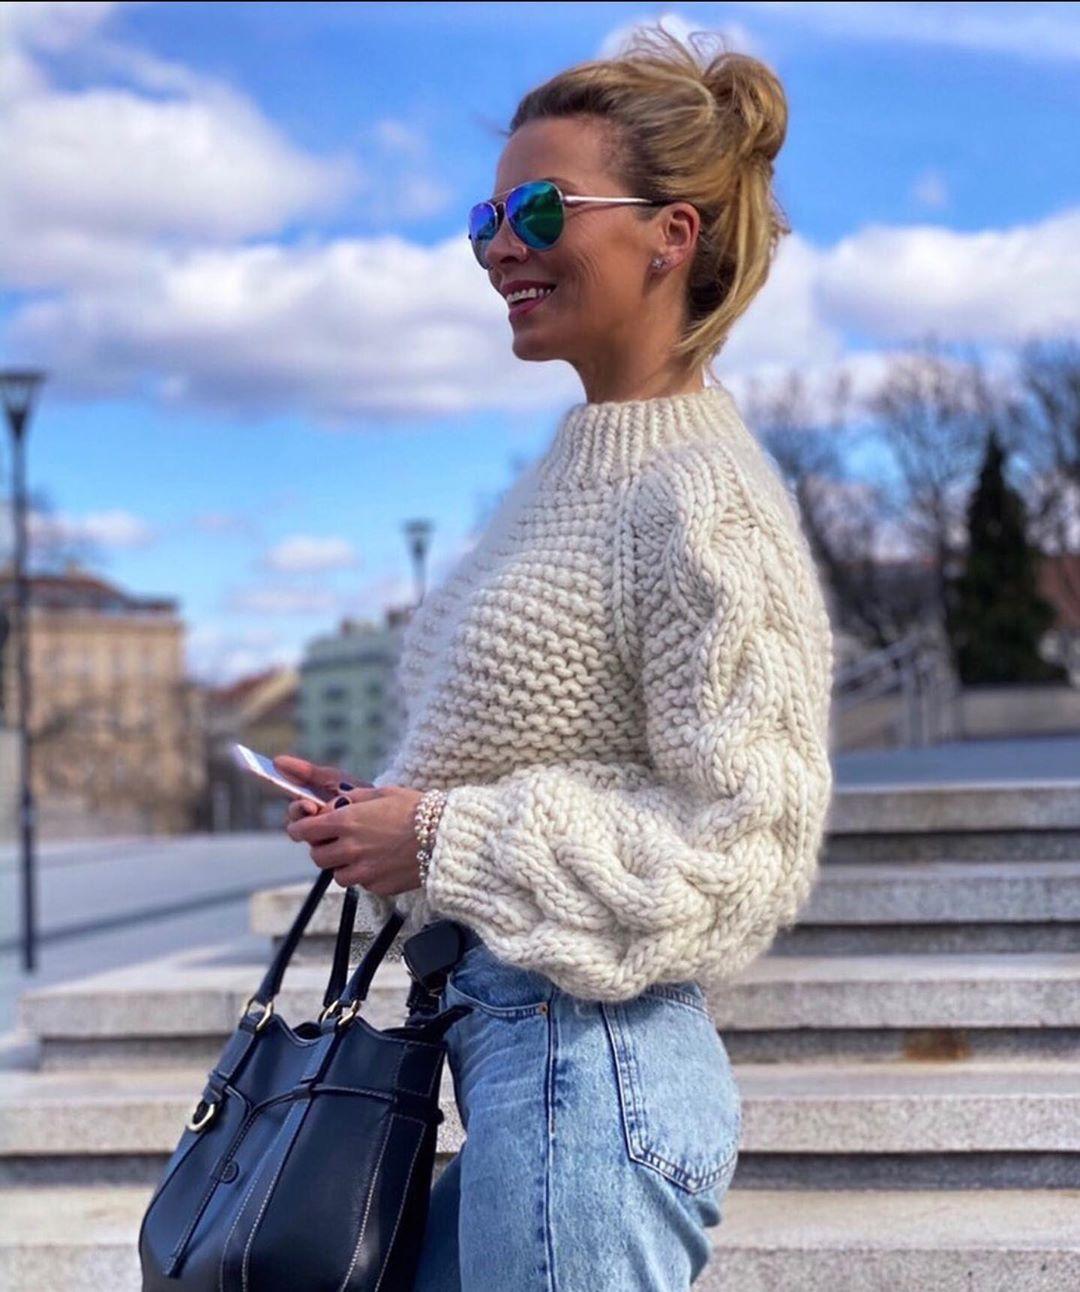 Chunky White Knit From La Stella Knitwe - Chunky Knit